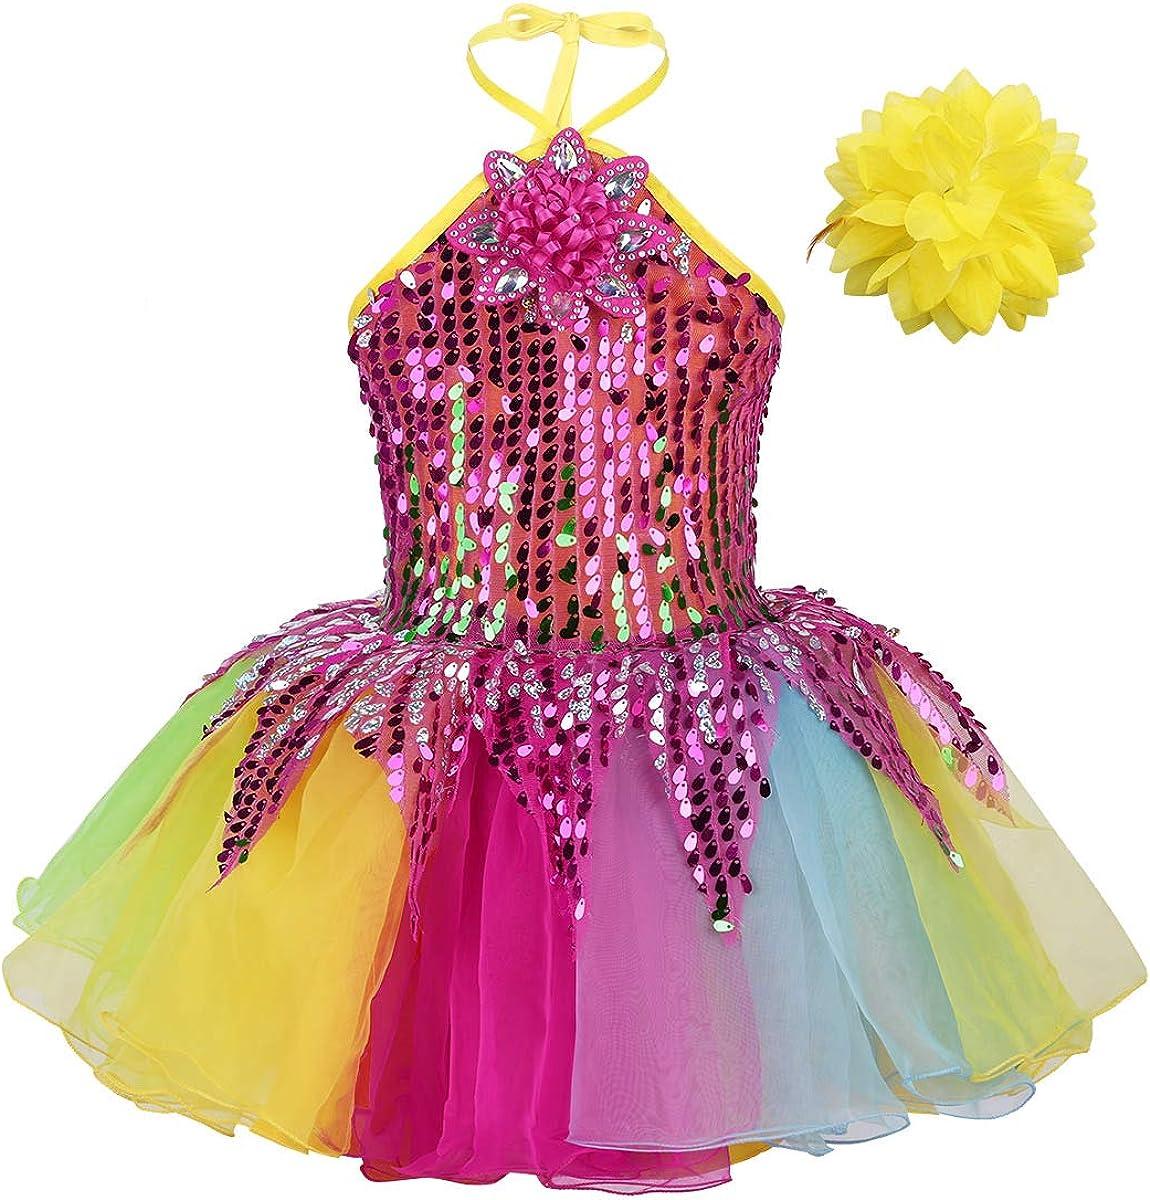 UK Girls Dance Costume Halter Shiny Sequins Crop Top+Tutu Dress Outfit Dancewear